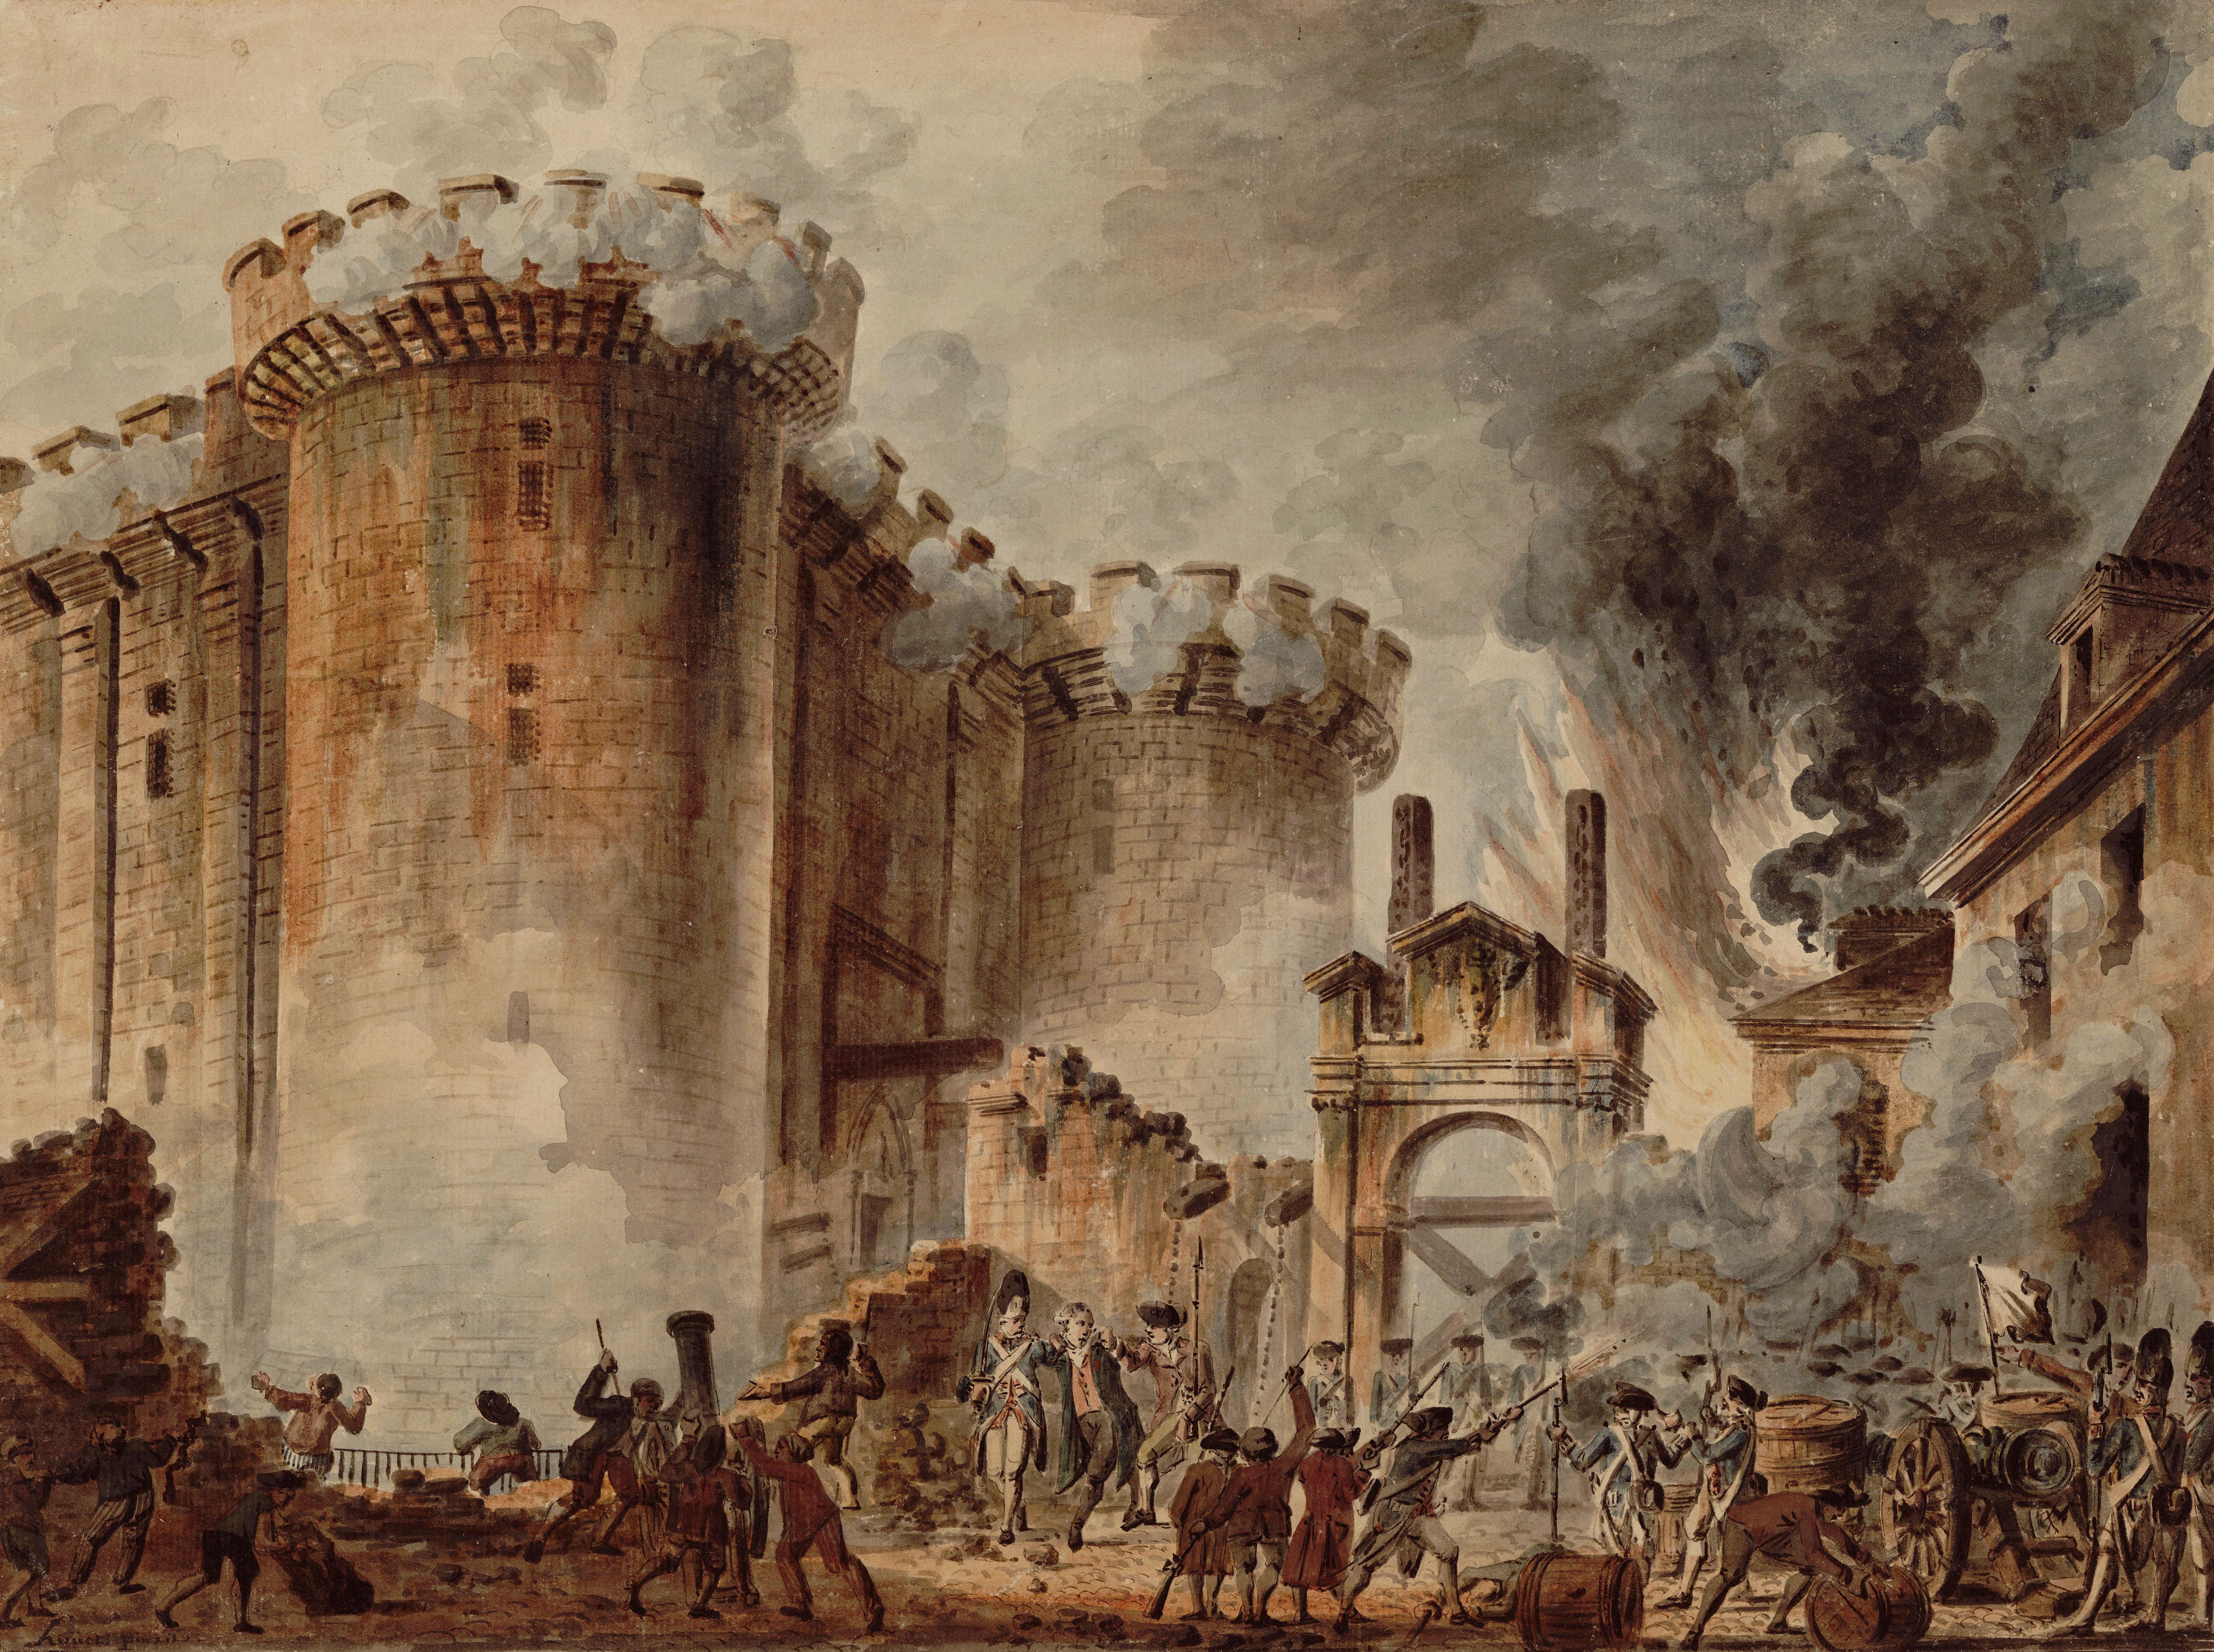 http://upload.wikimedia.org/wikipedia/commons/4/4e/Prise_de_la_Bastille.jpg?uselang=fa